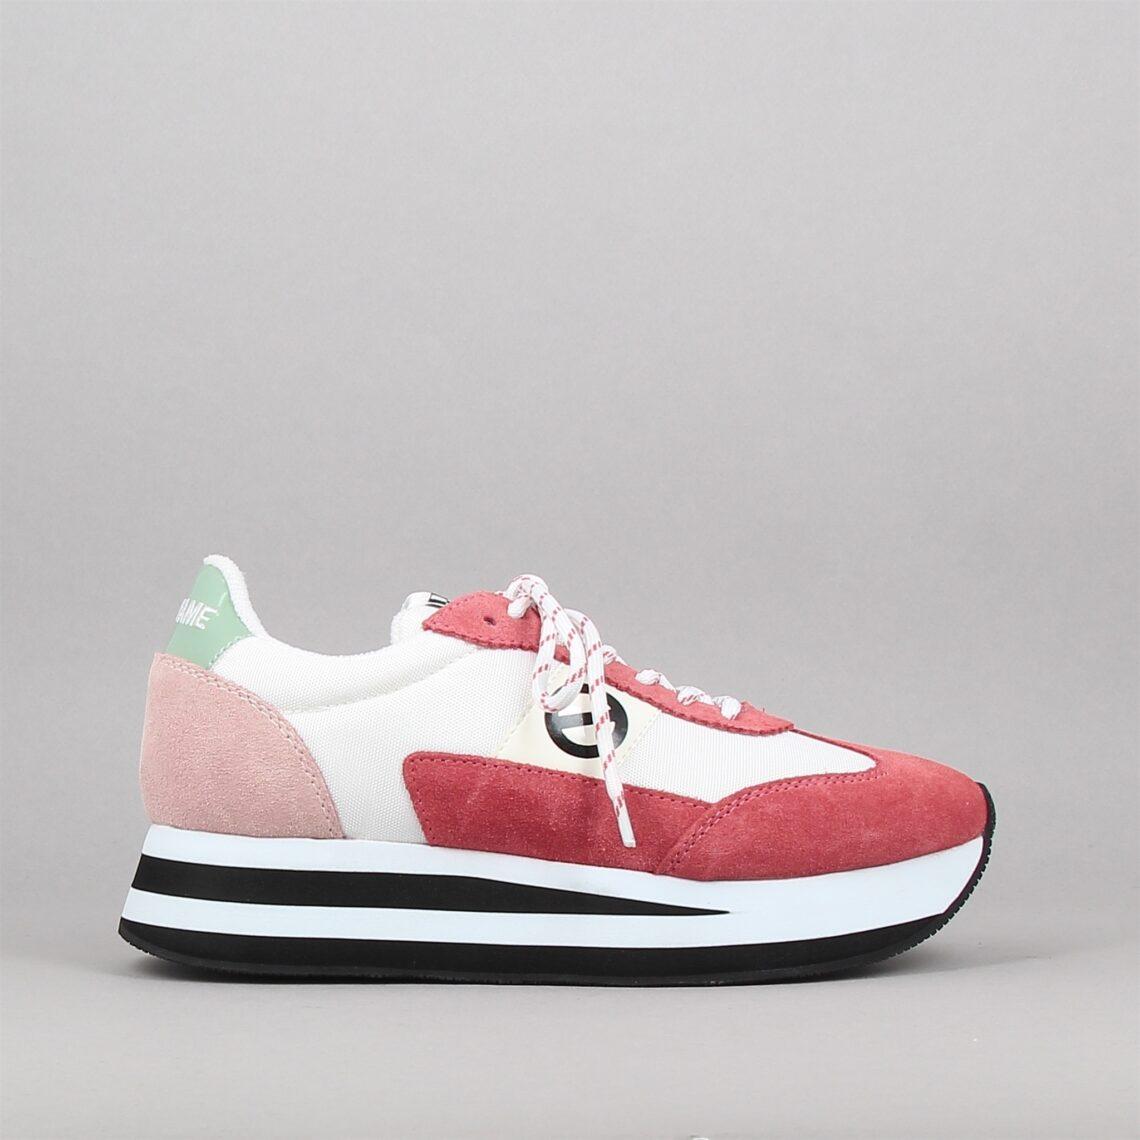 flex-jogger-19-rose-171900930-0.jpg